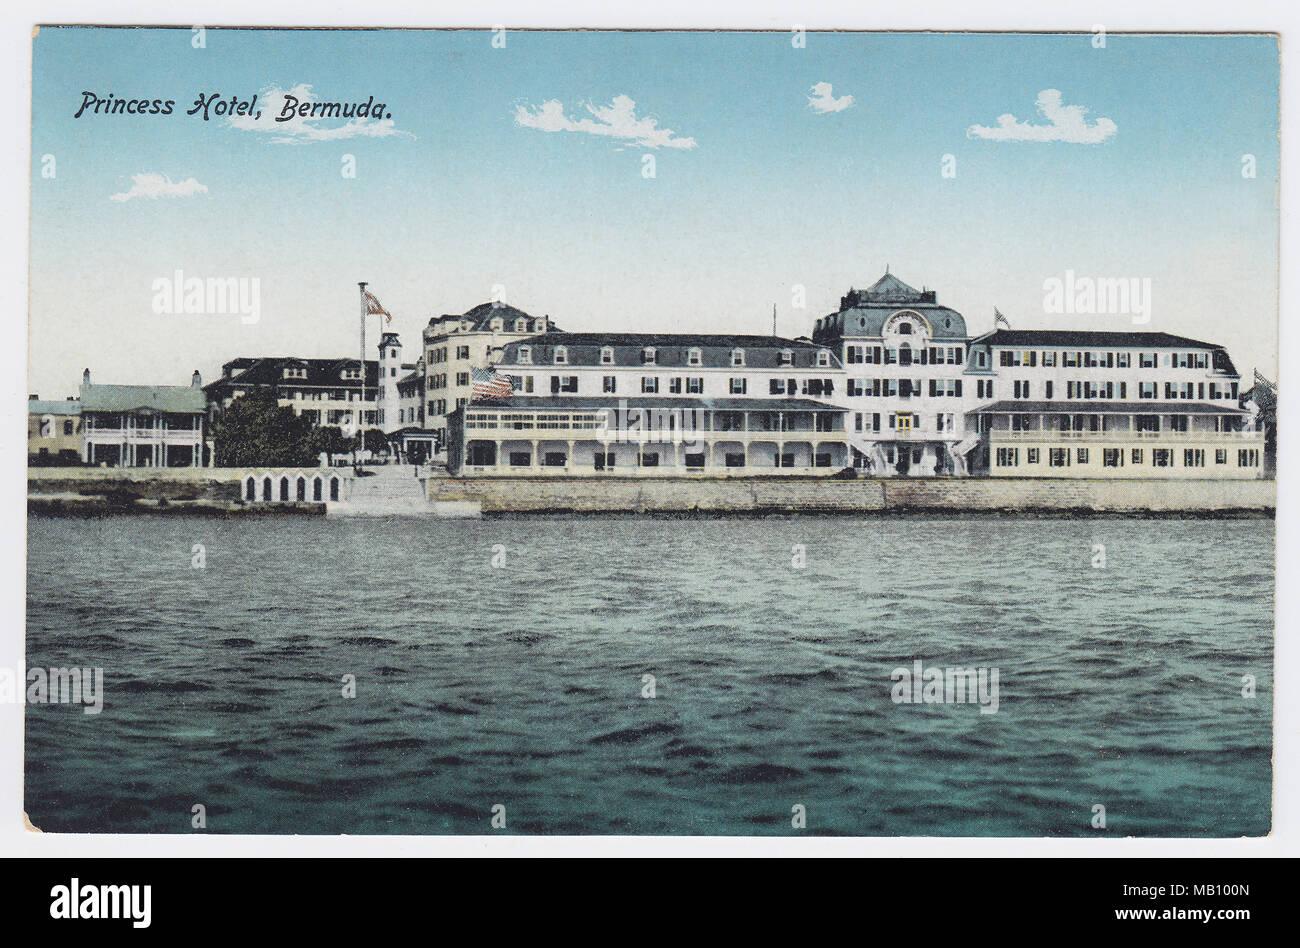 Princess Hotel, Hamilton, Bermuda - Stock Image